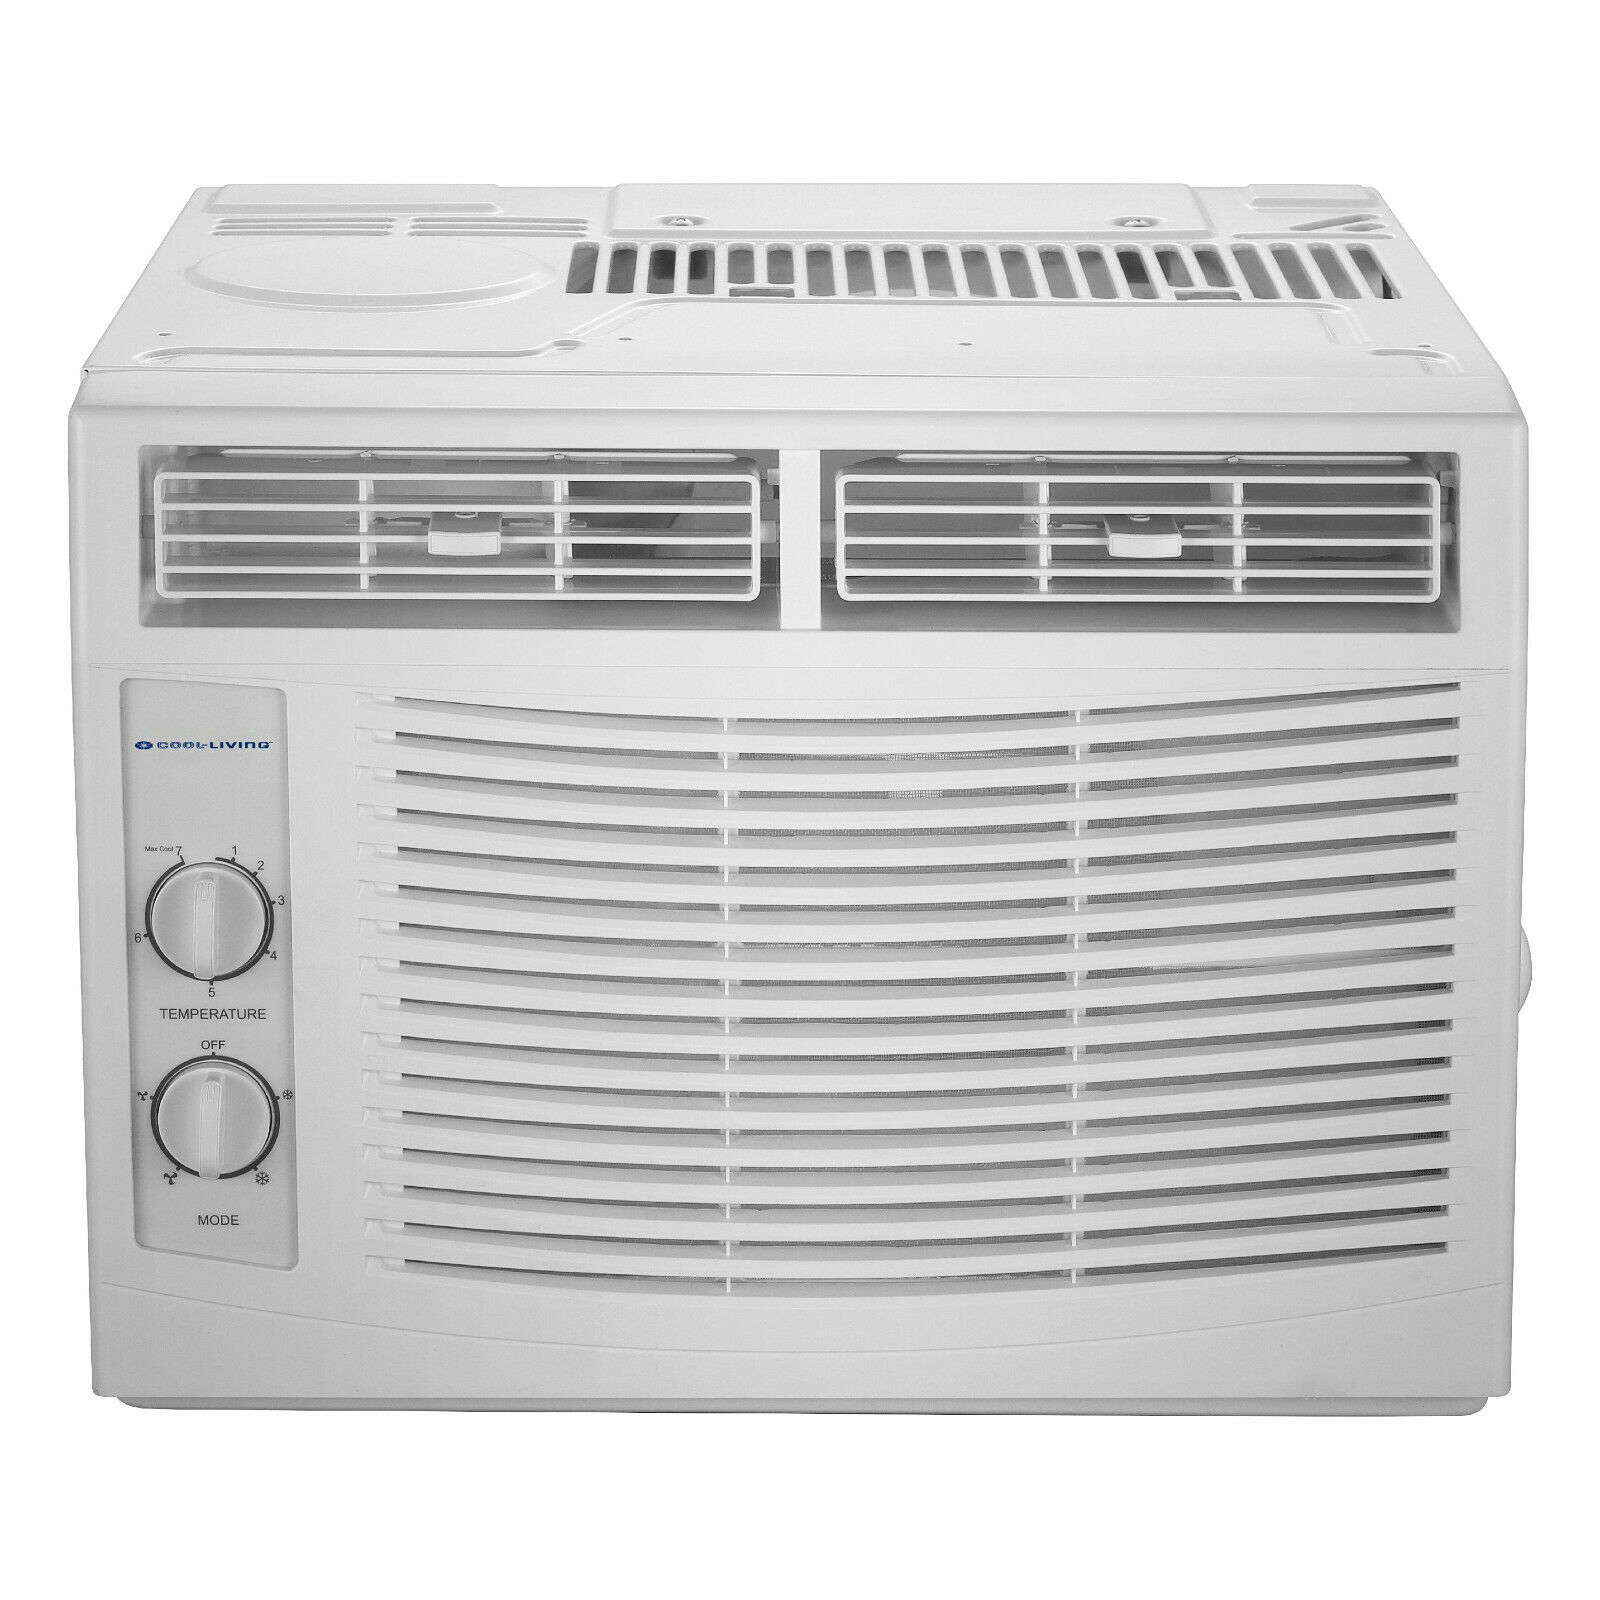 Bedroom Window AC Unit Air Conditioner 5000 Mini Compact 115